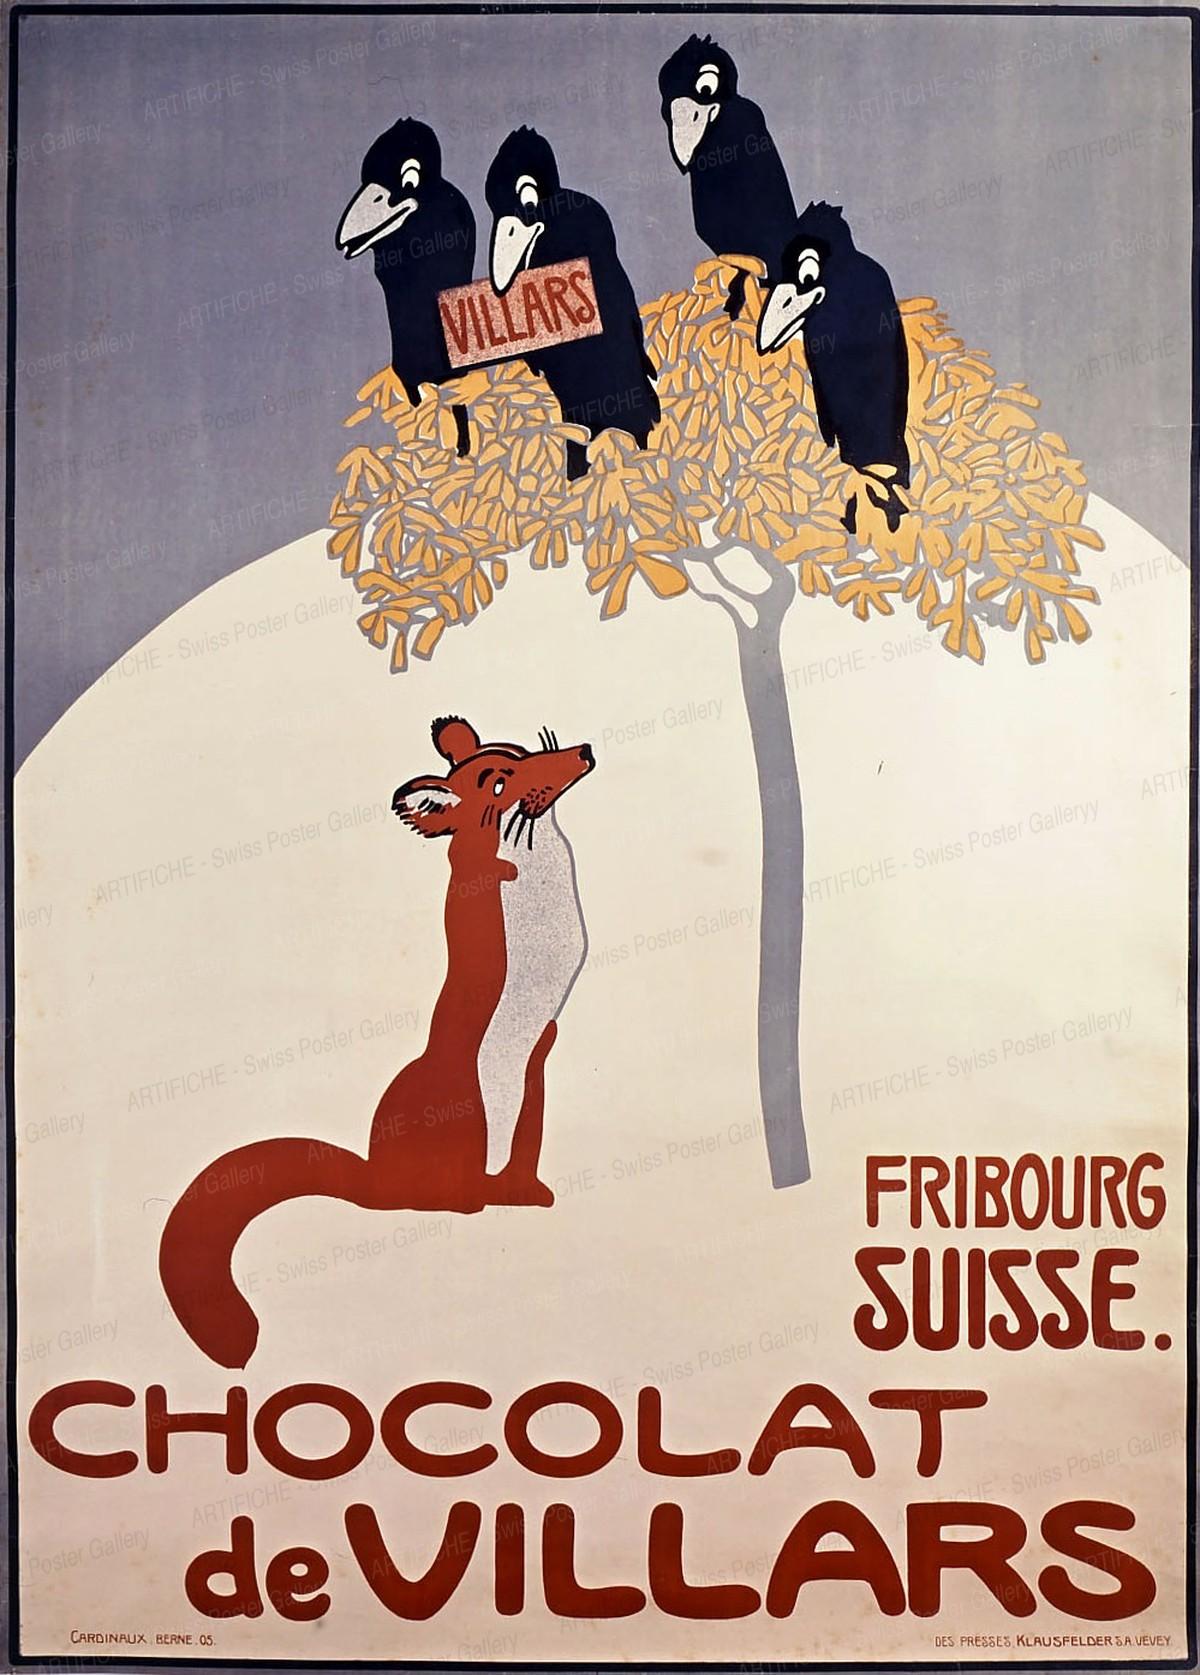 Chocolate Villars Fribourg, Emil Cardinaux